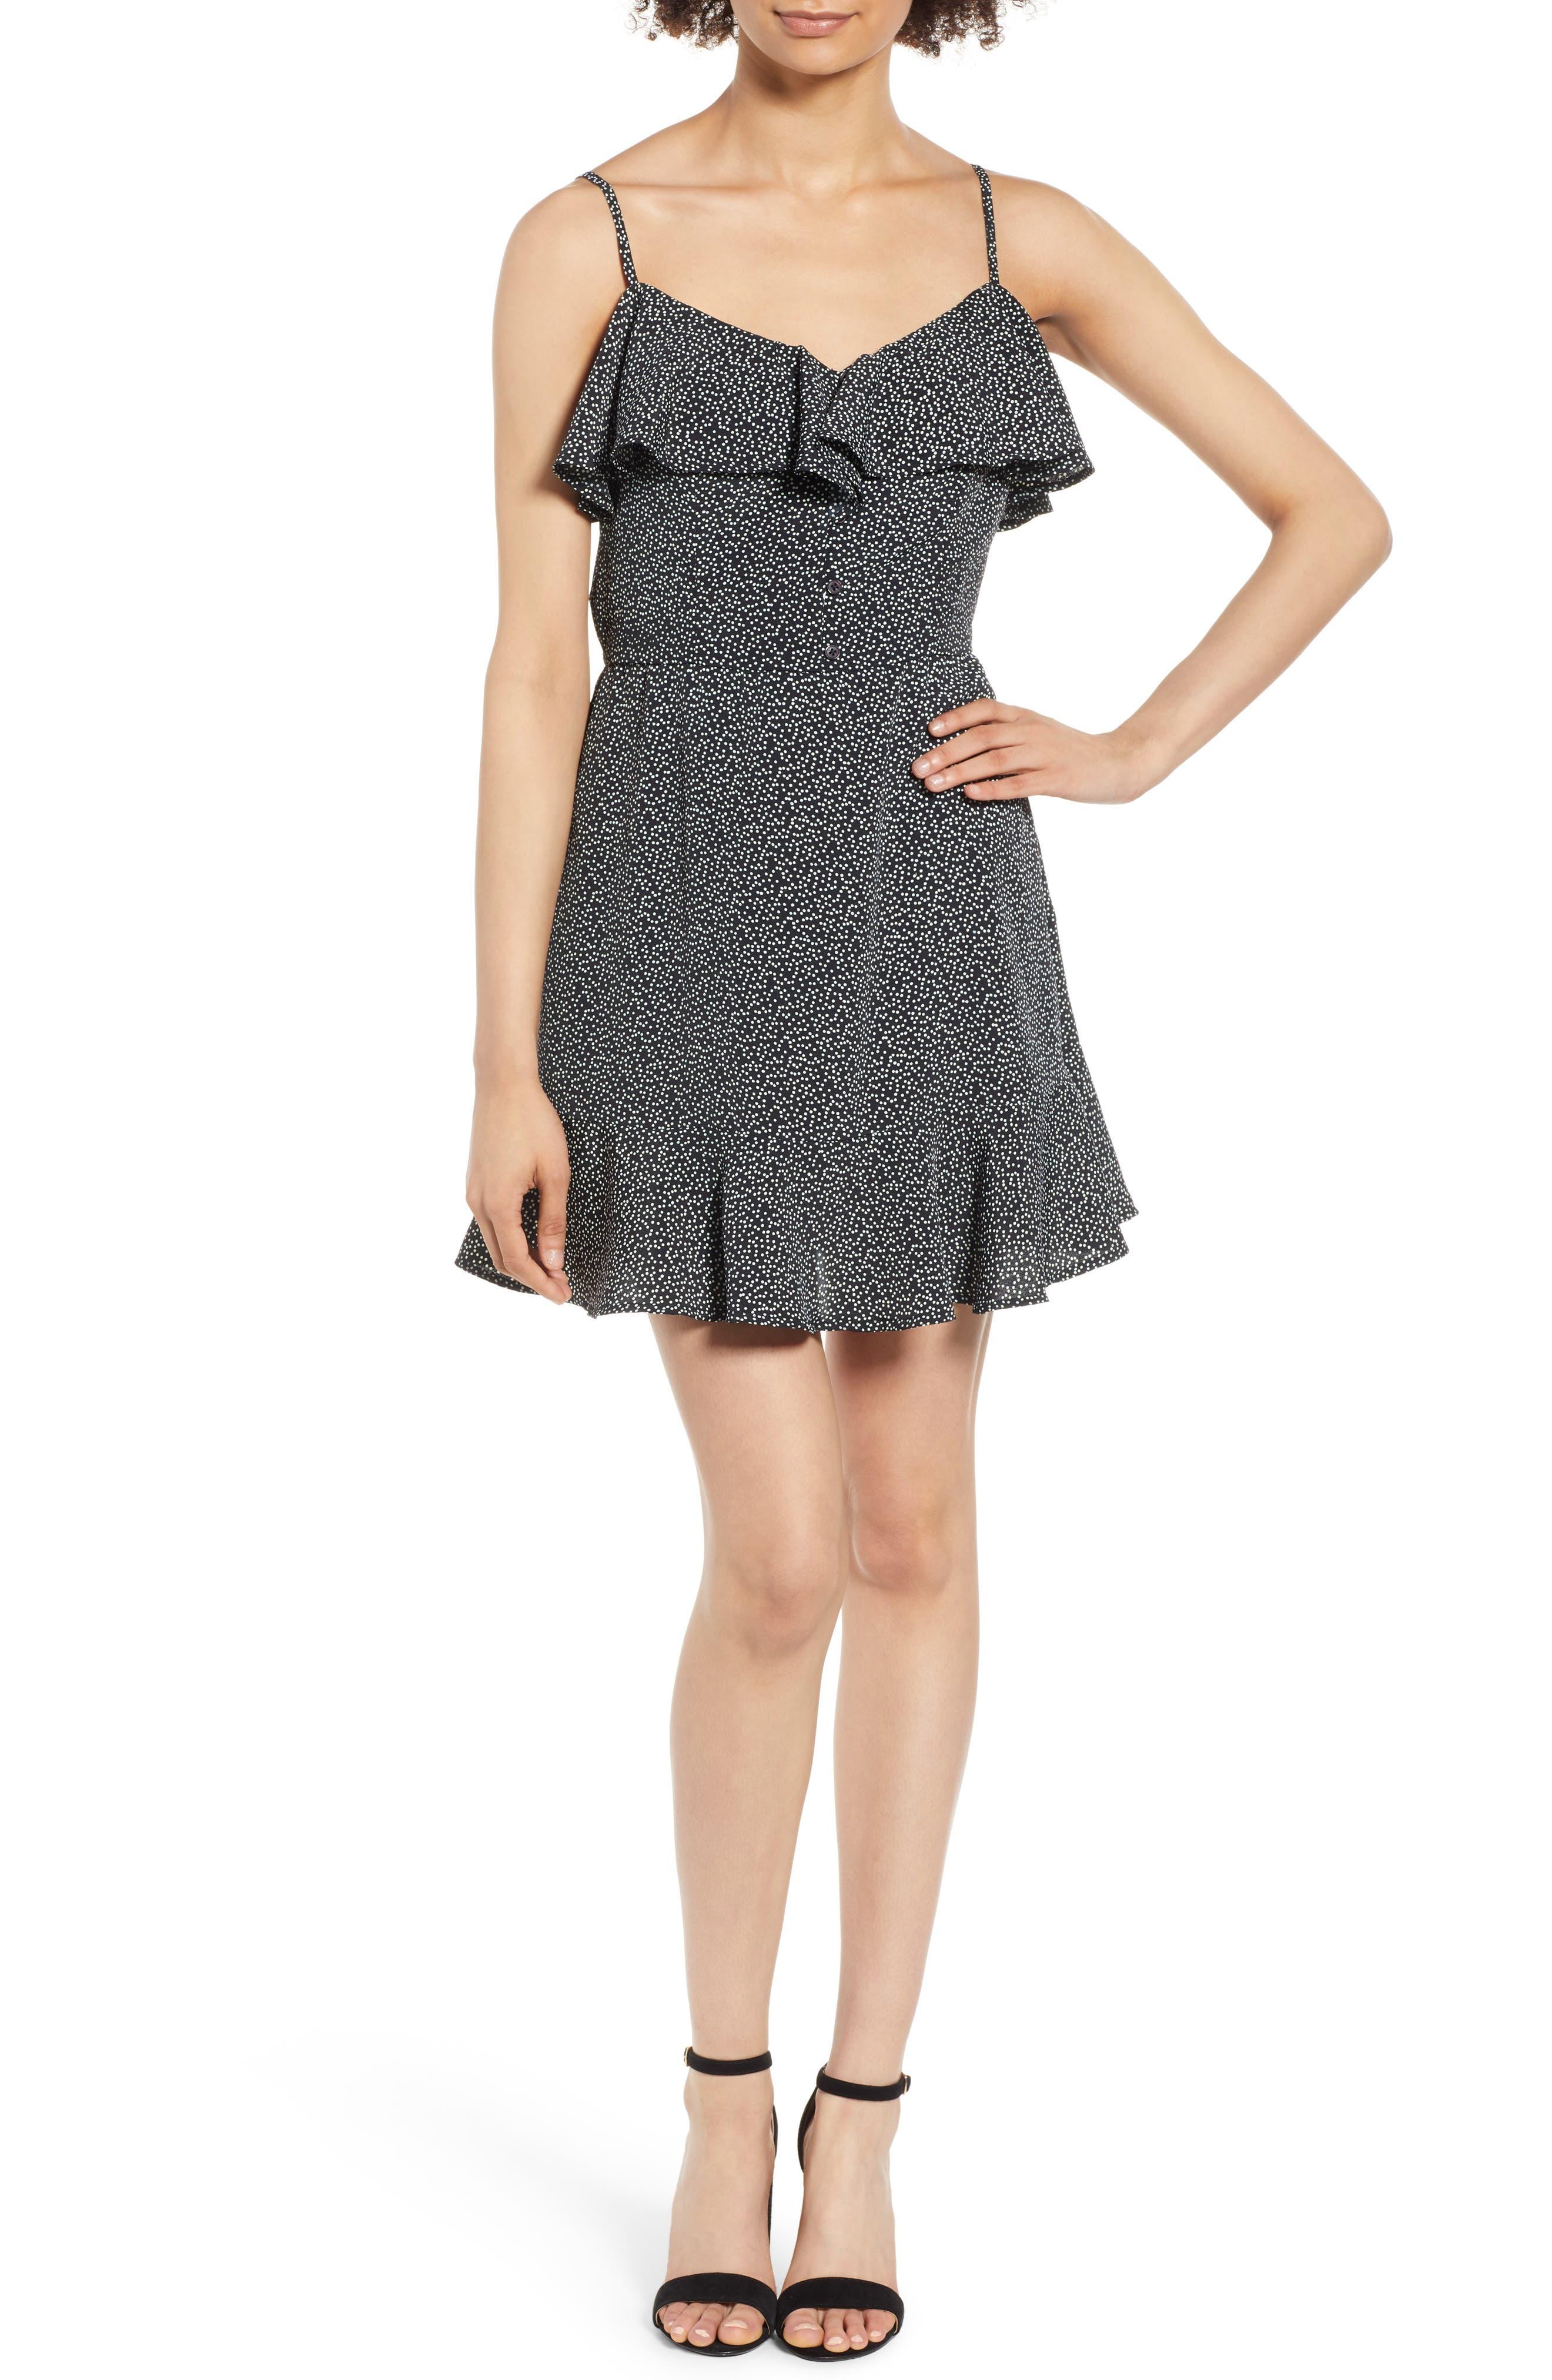 Button Front Frilly Dot Dress,                             Main thumbnail 1, color,                             Black Ground Polka Dot